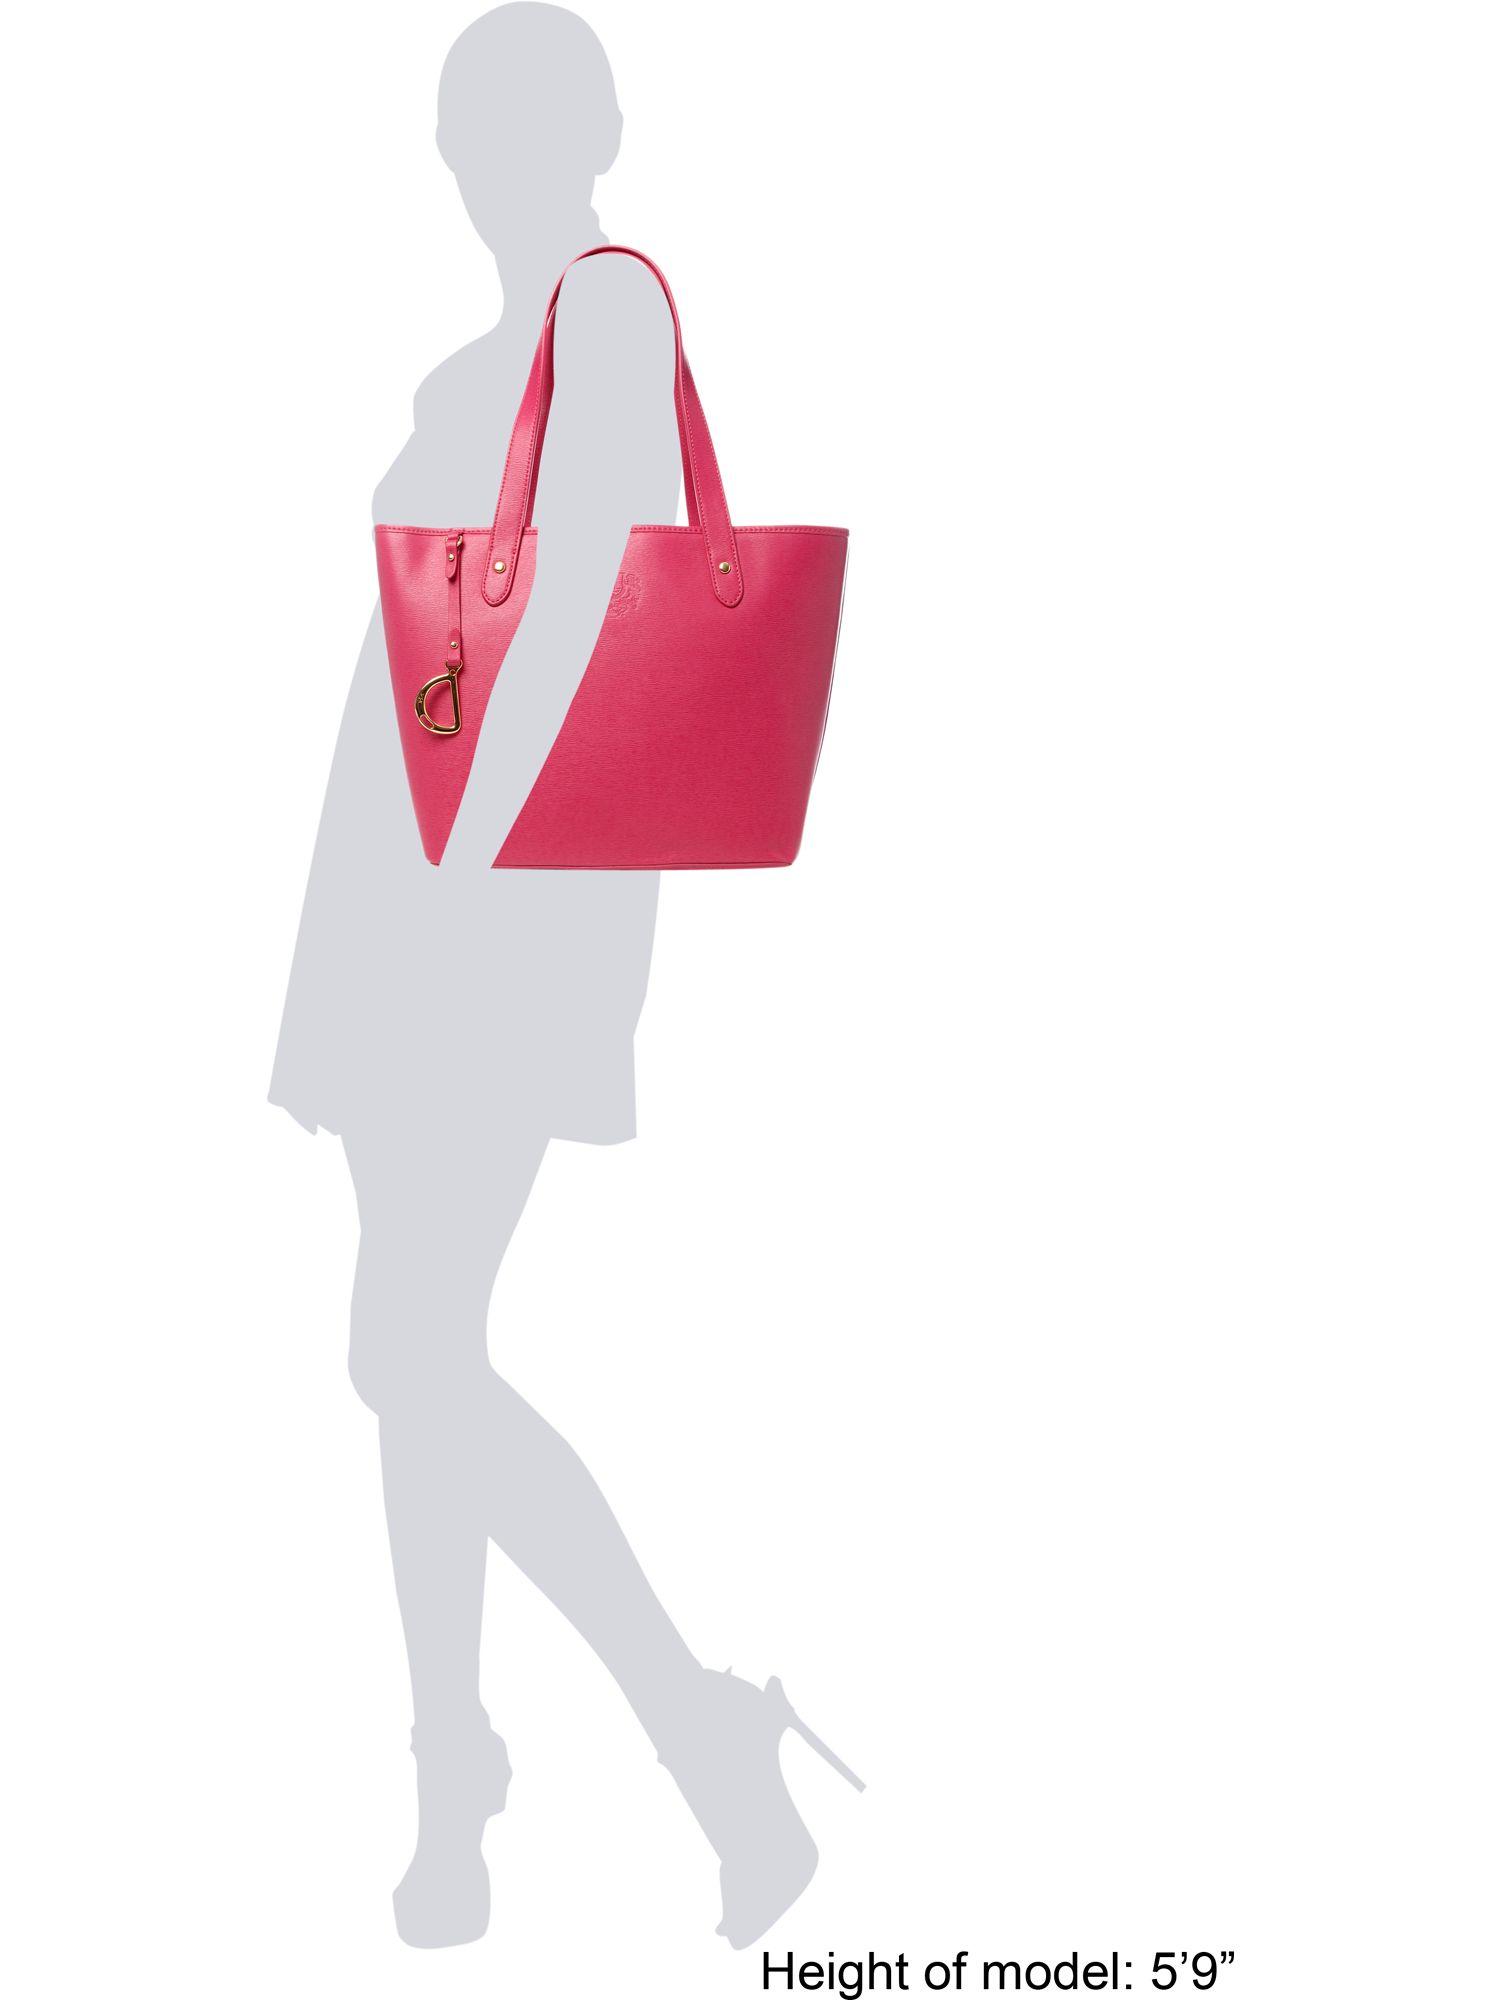 Lyst - Lauren By Ralph Lauren Large Newbury Tote Bag in Pink b7b2e41489